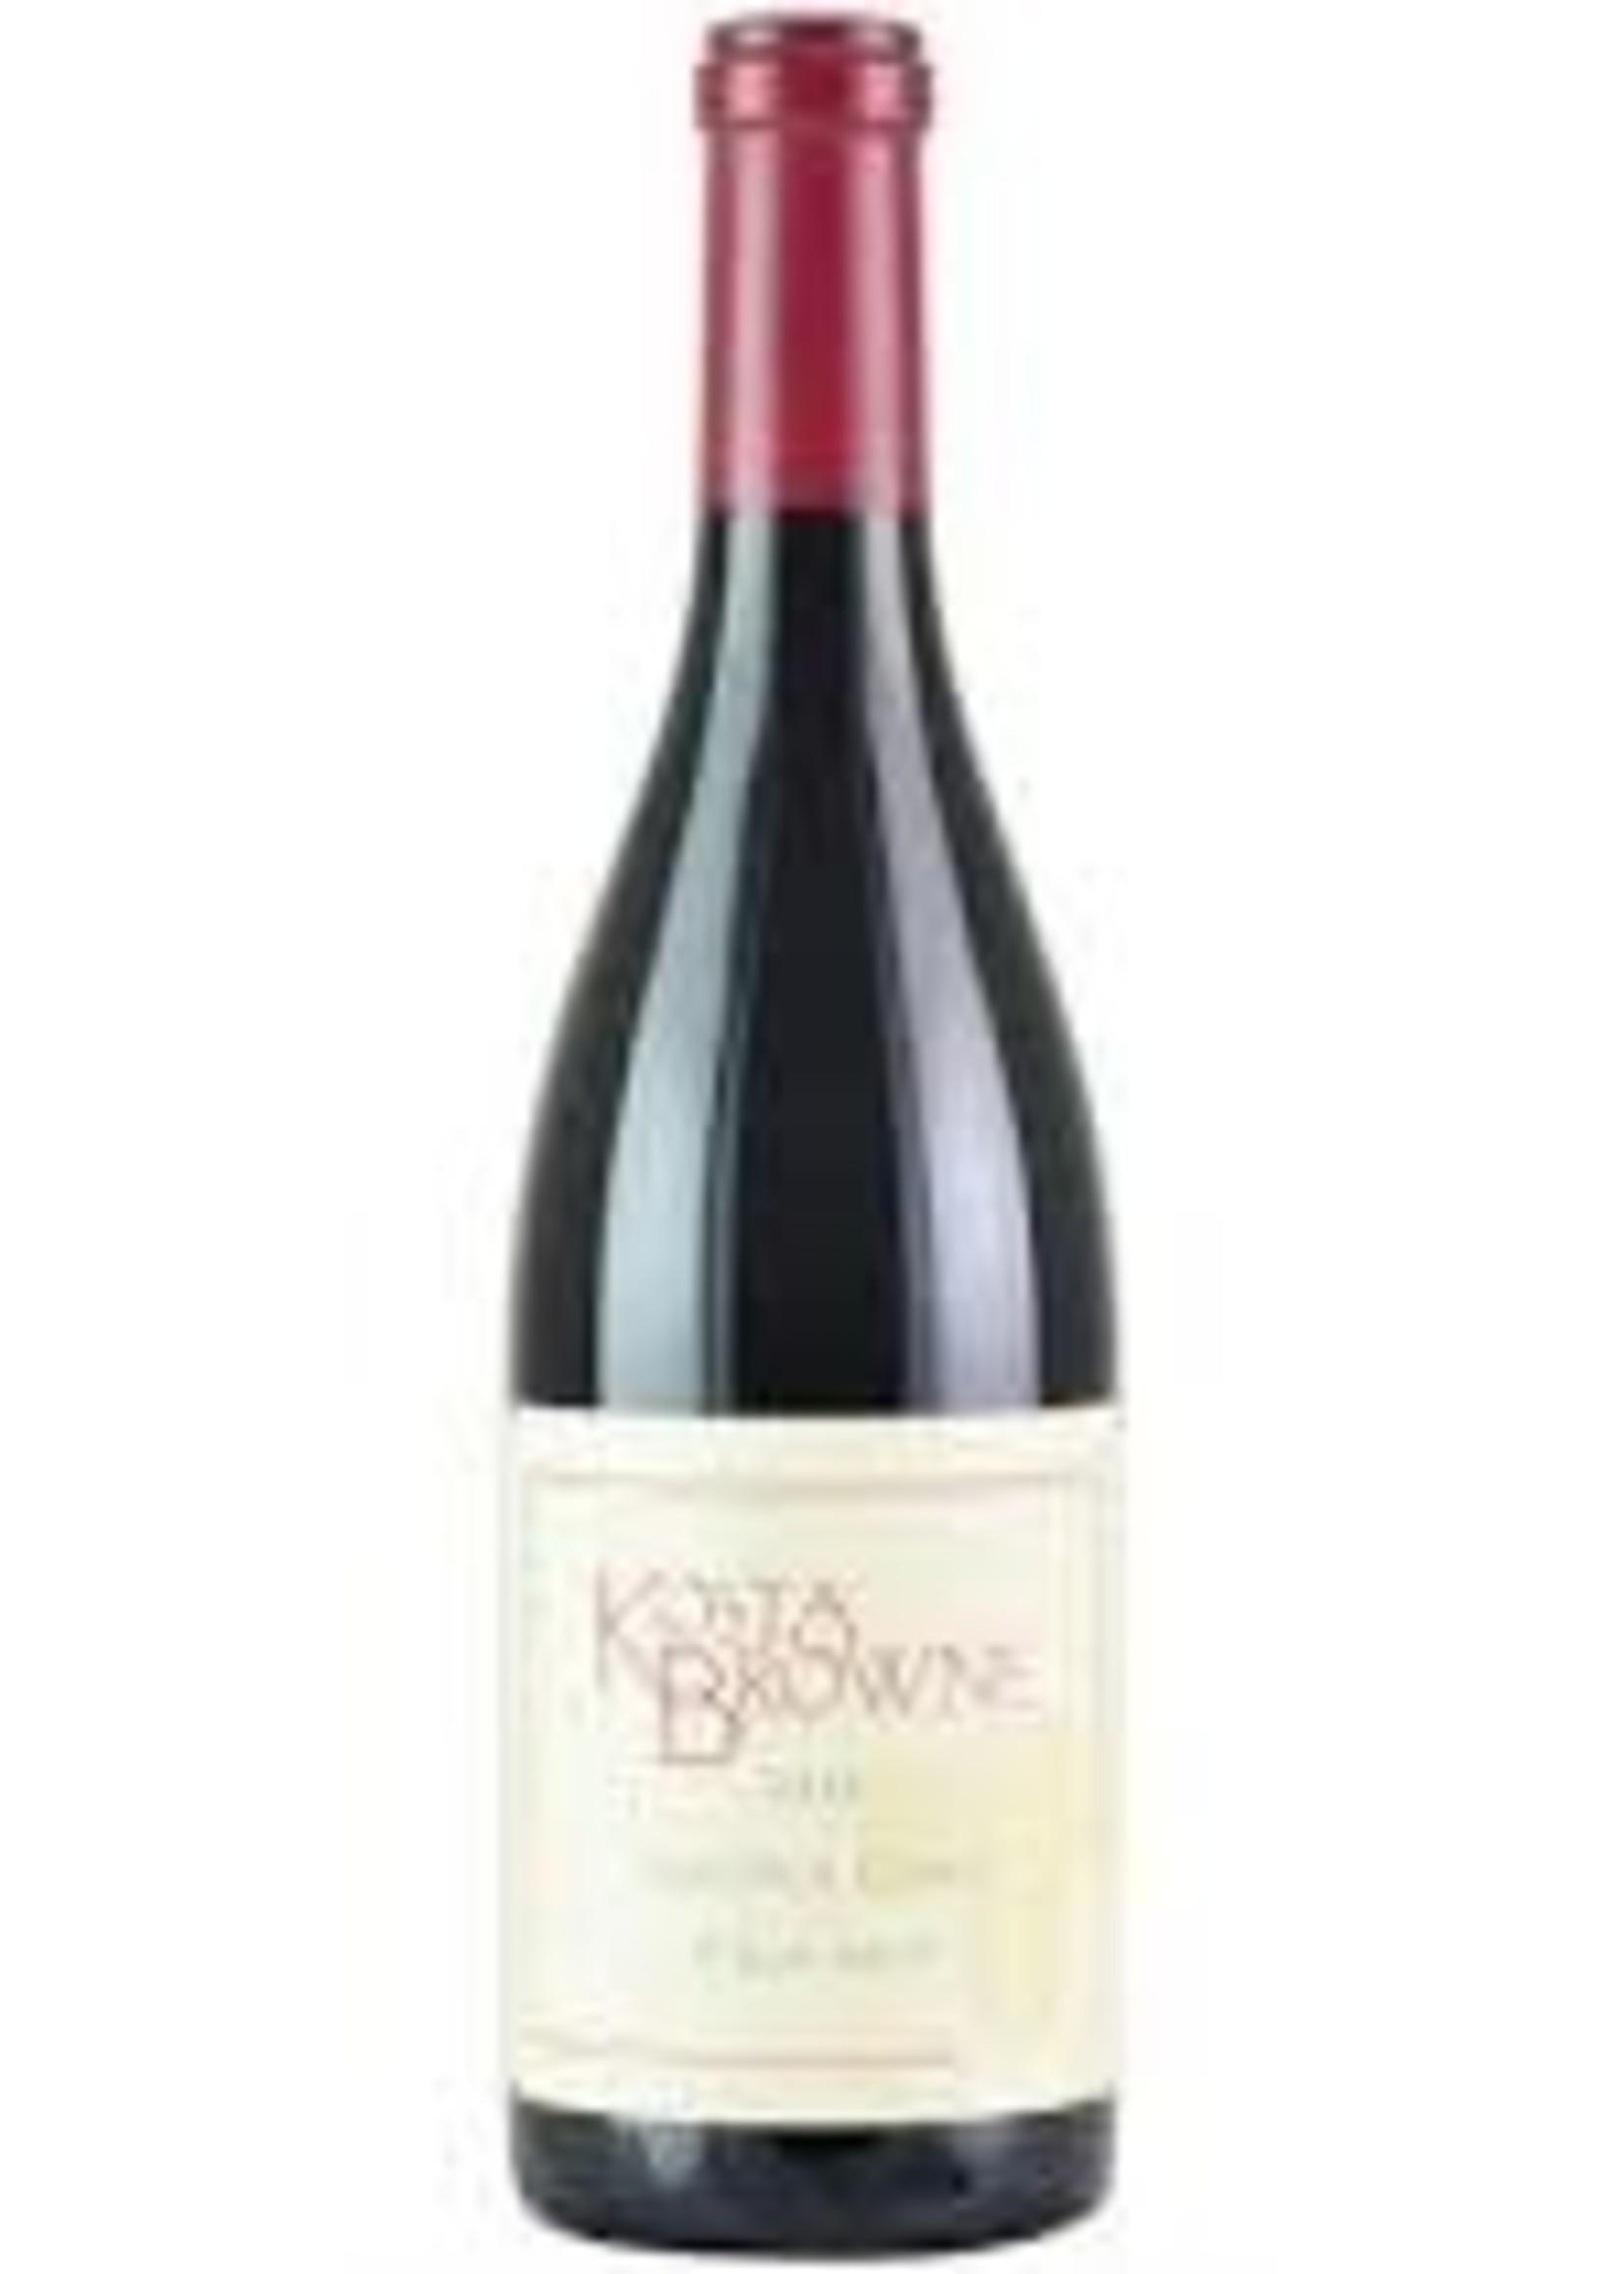 Kosta Browne 2018 Pinot Noir Sonoma Coast 750ml